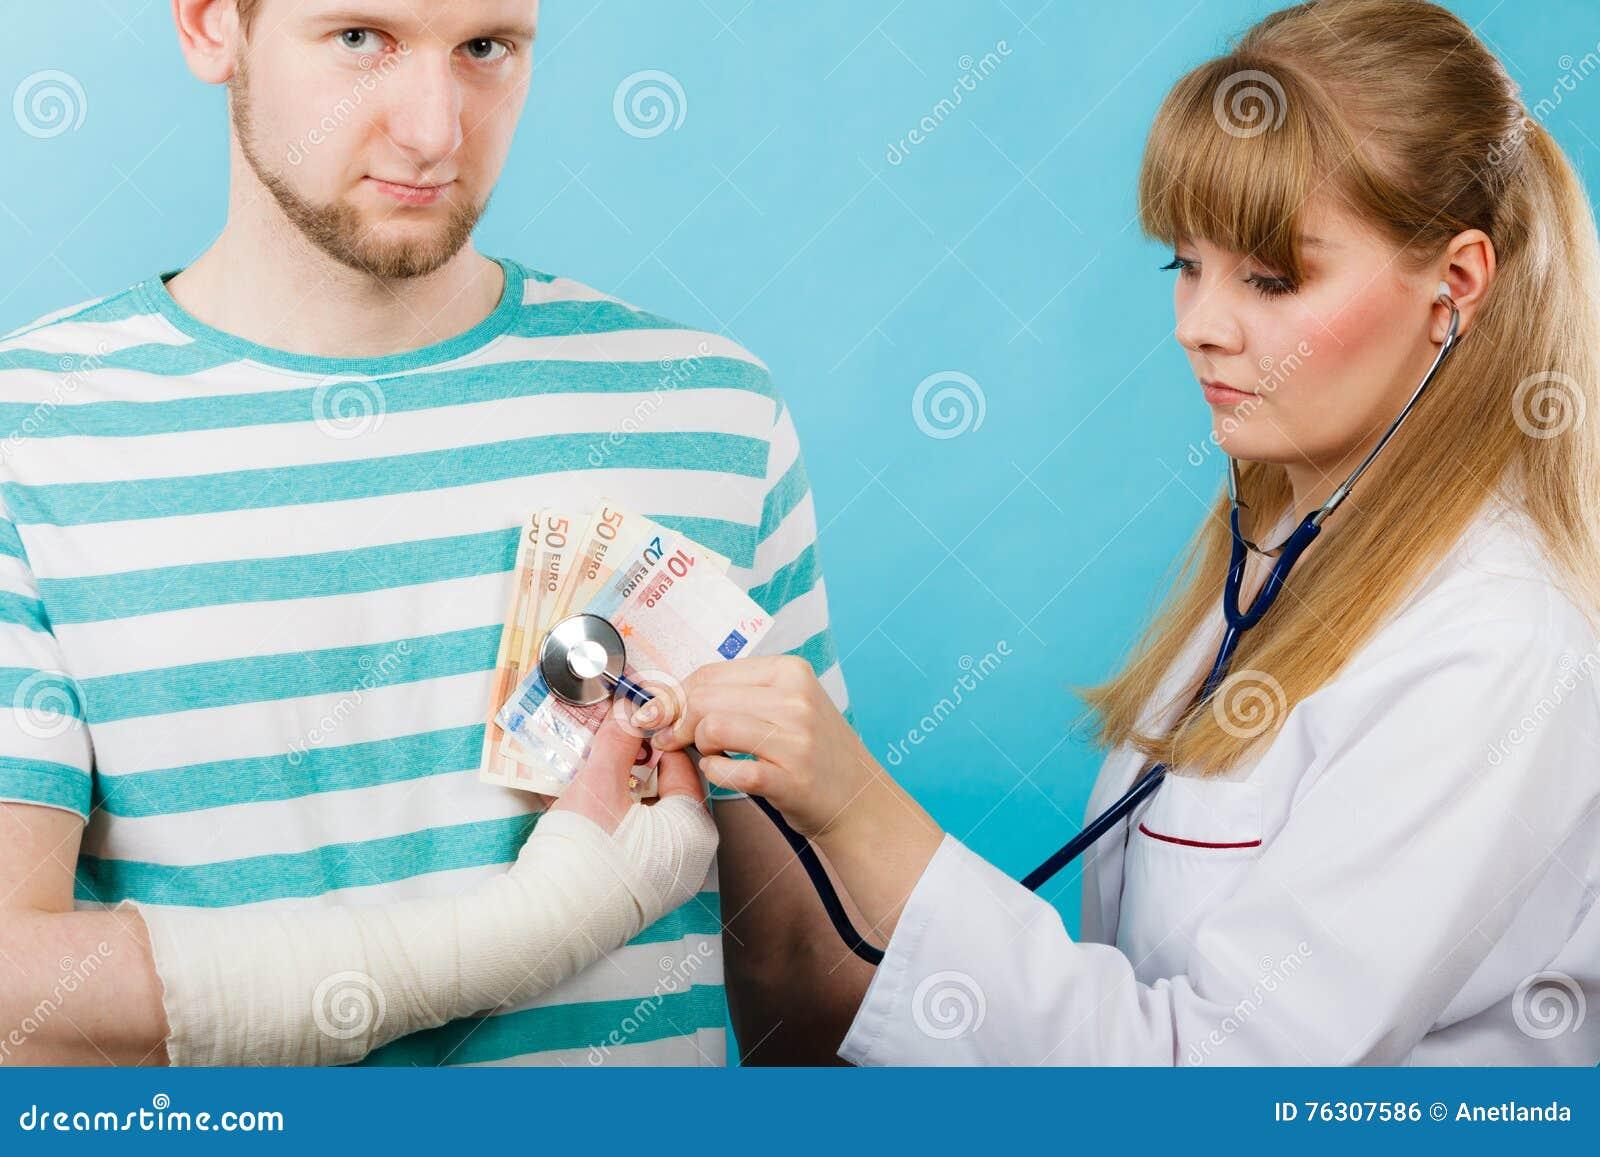 Female doctor checking heart beating.